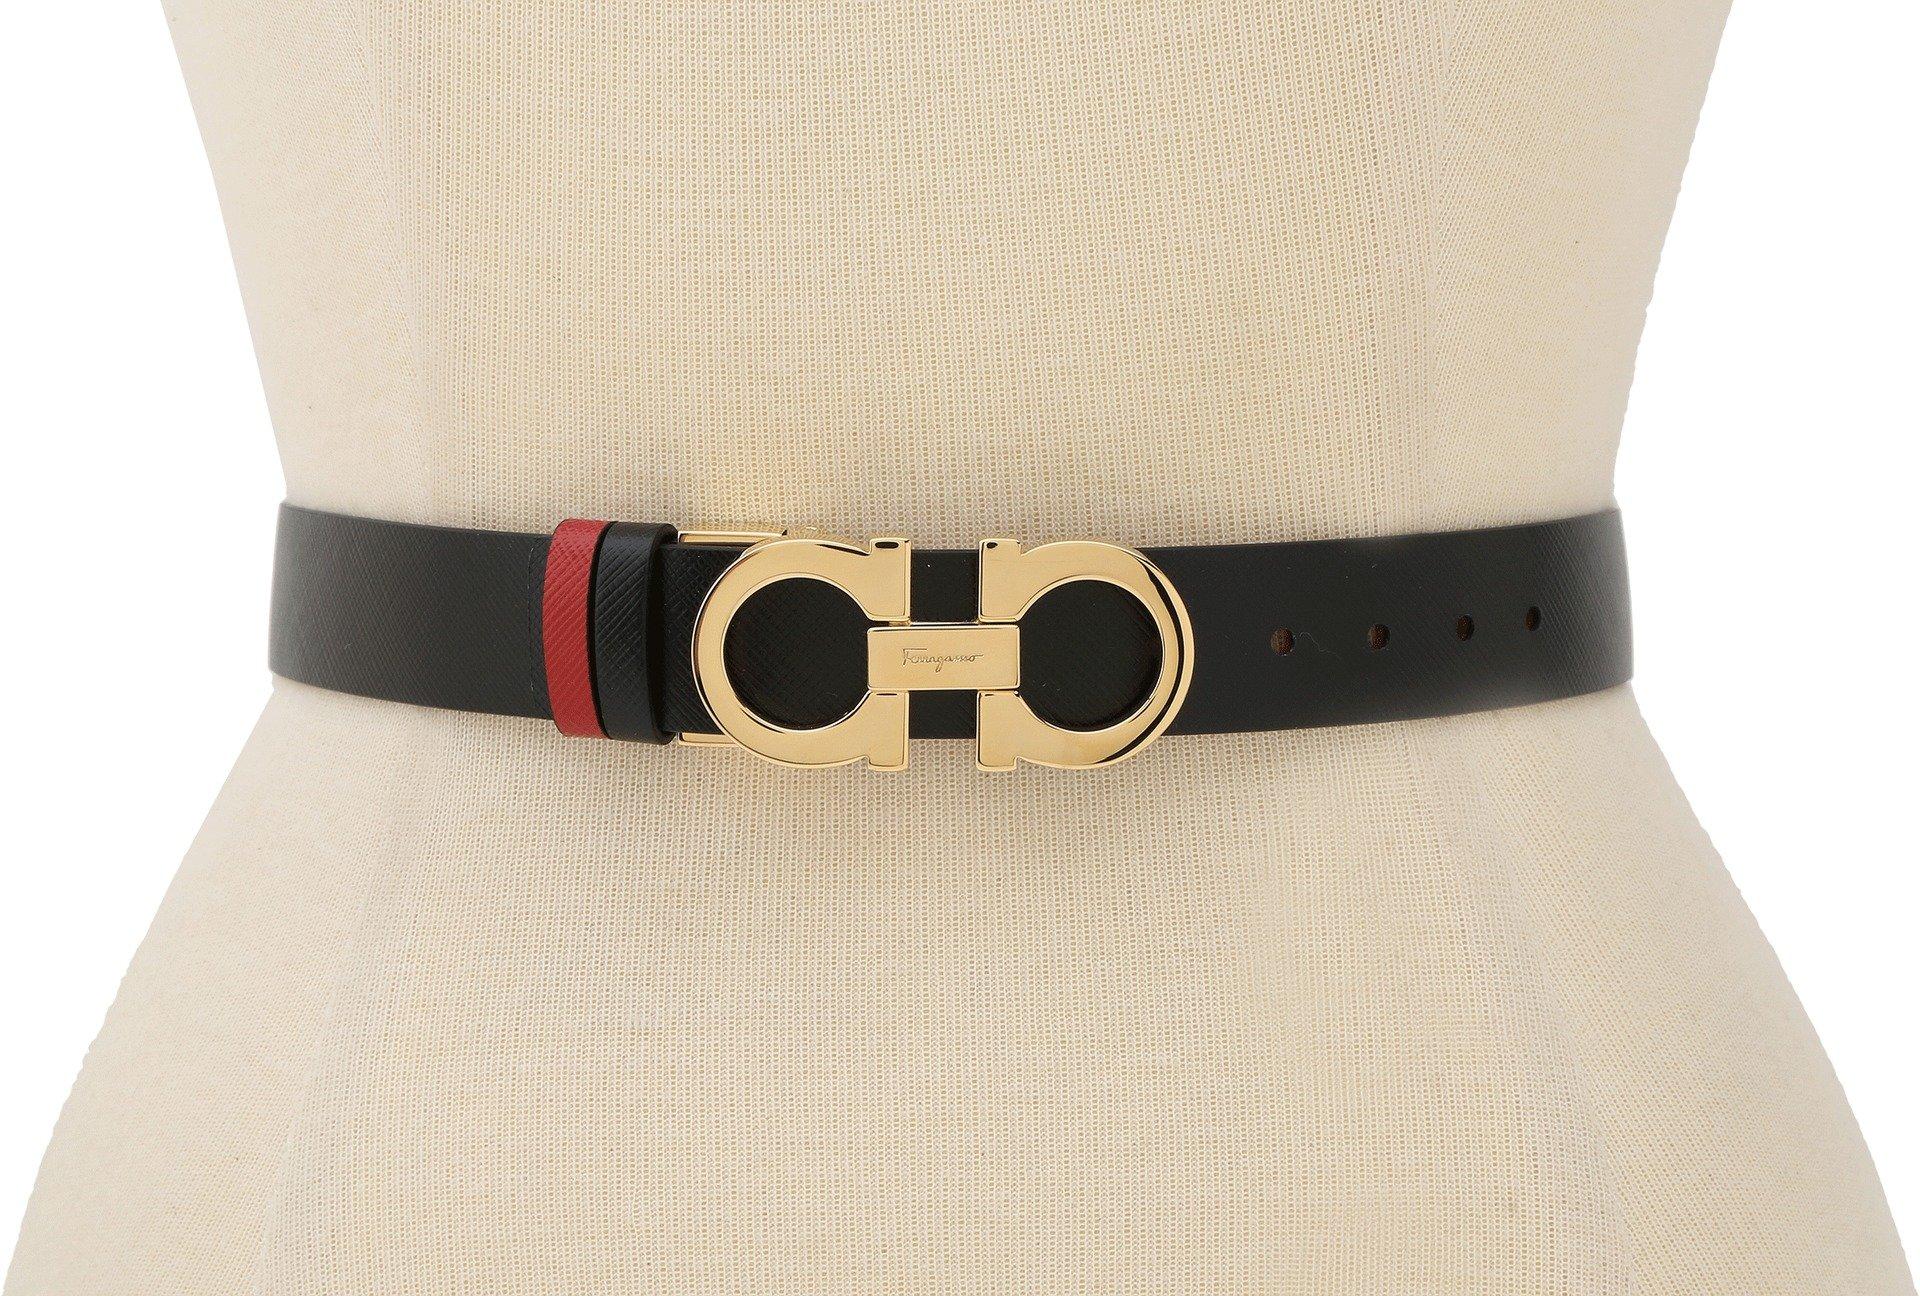 Salvatore Ferragamo Women's A565 Belt Rosso Tissu Belt 70 (28'' Waist) by Salvatore Ferragamo (Image #2)